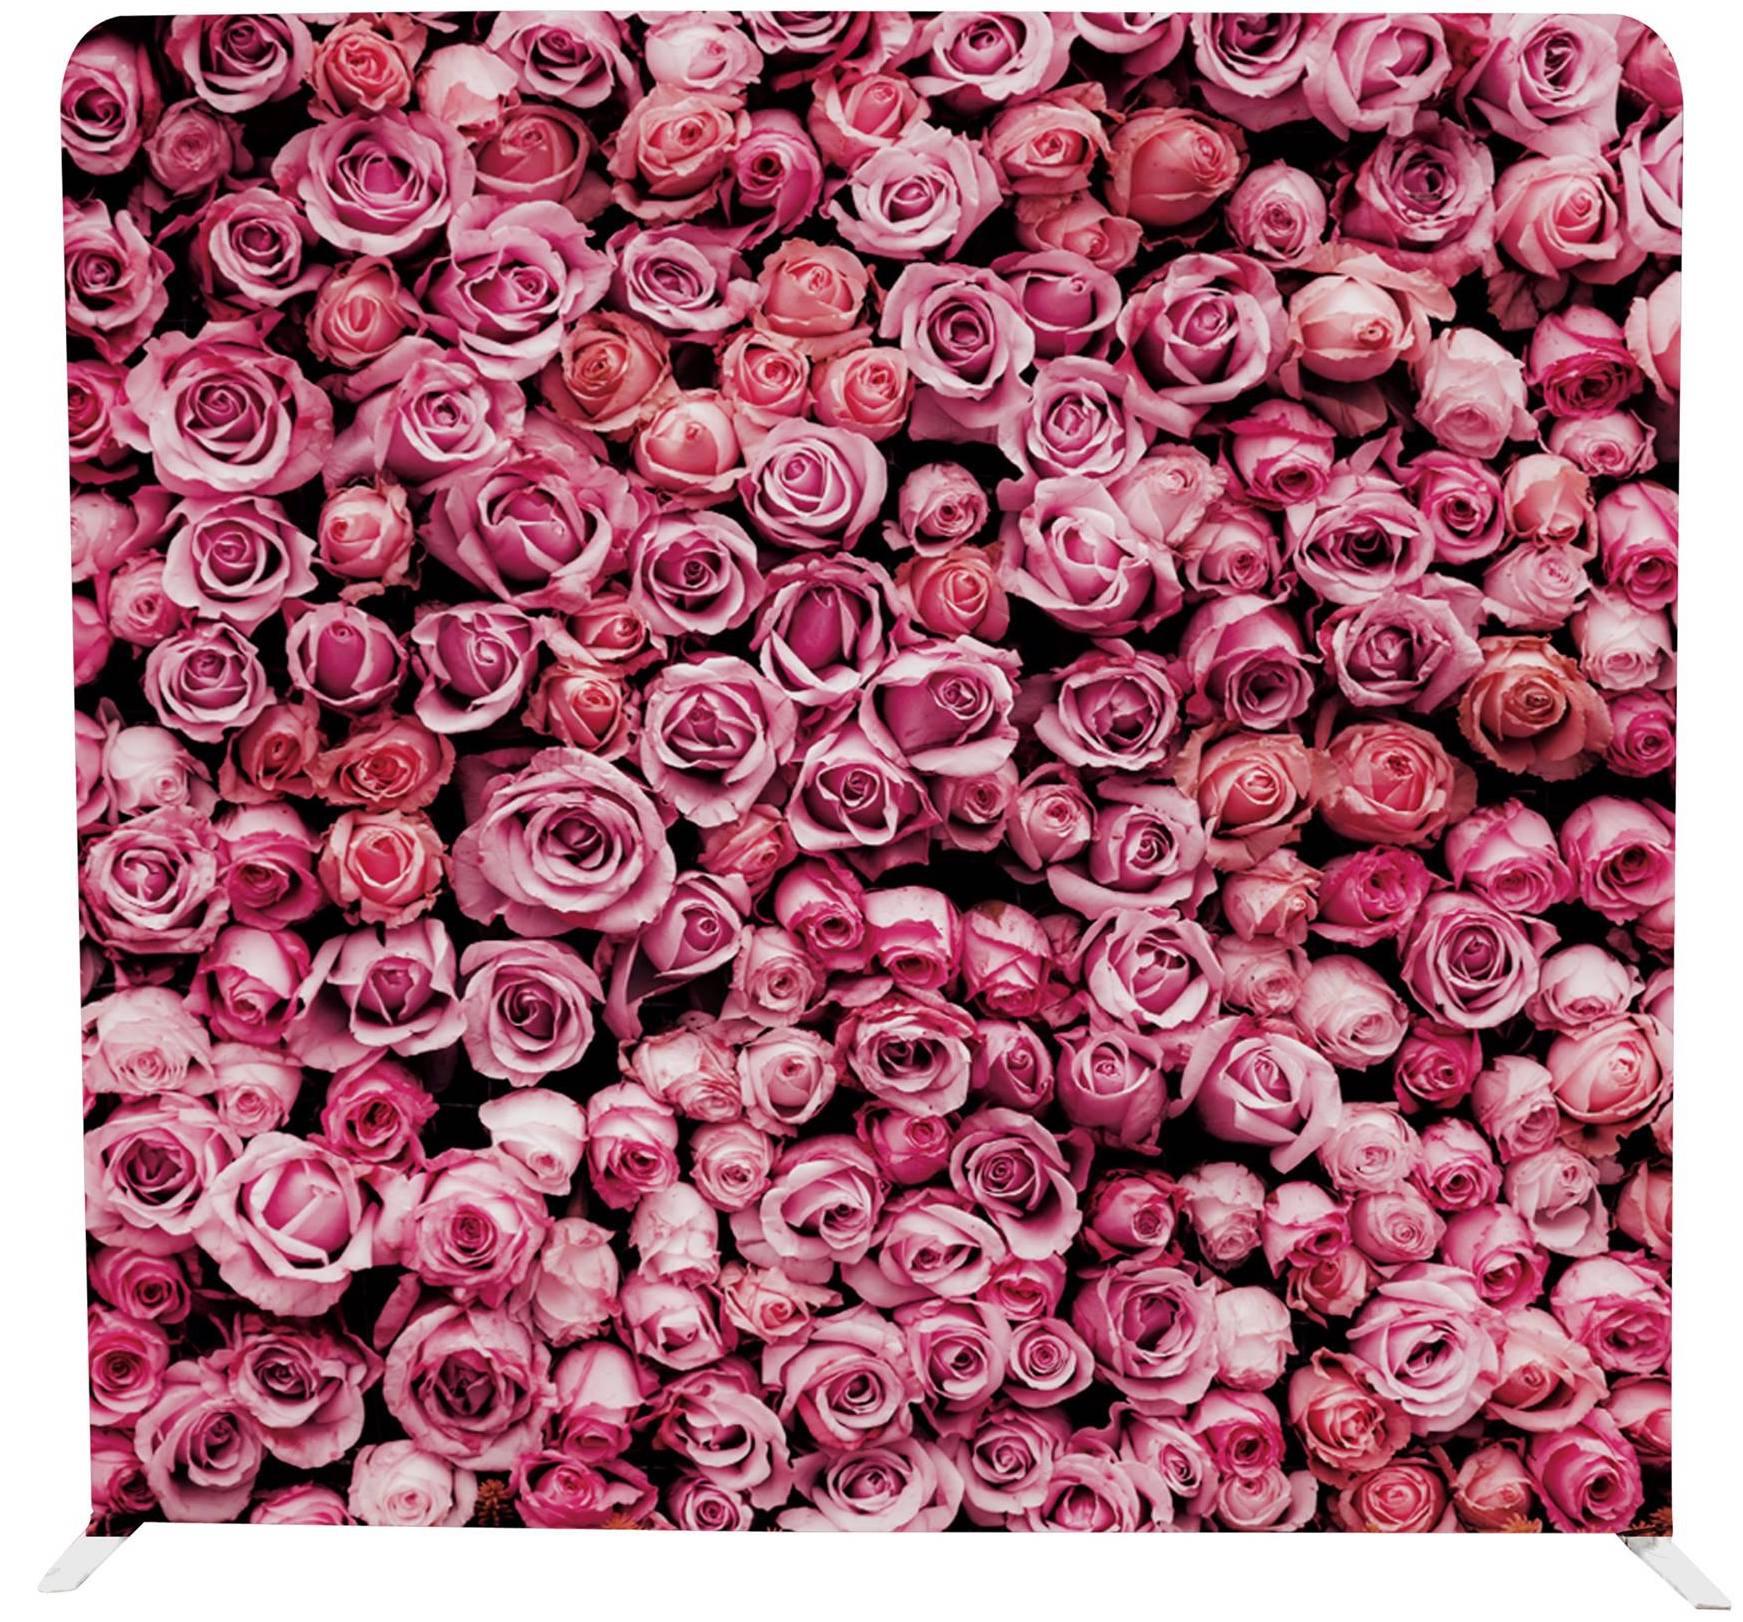 8x8ft Floral Backdrop